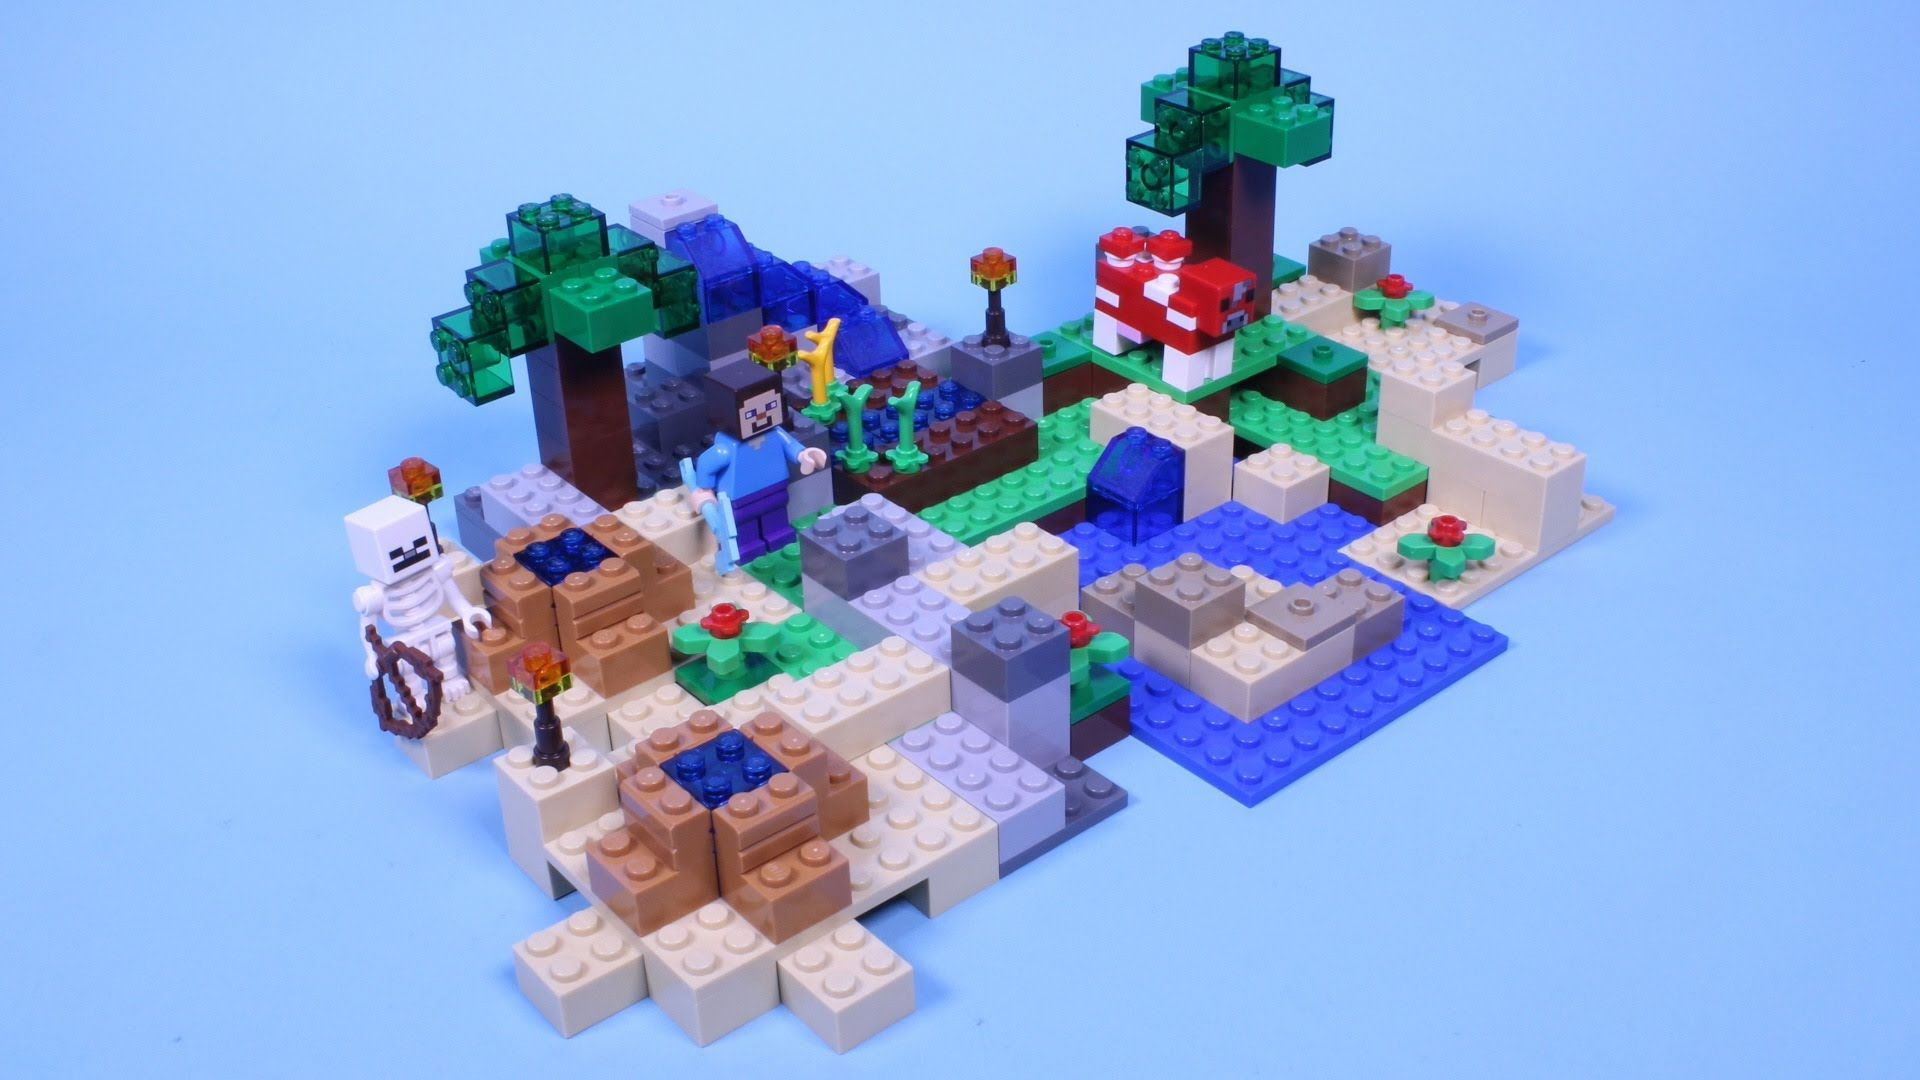 23++ Lego minecraft crafting box instructions ideas